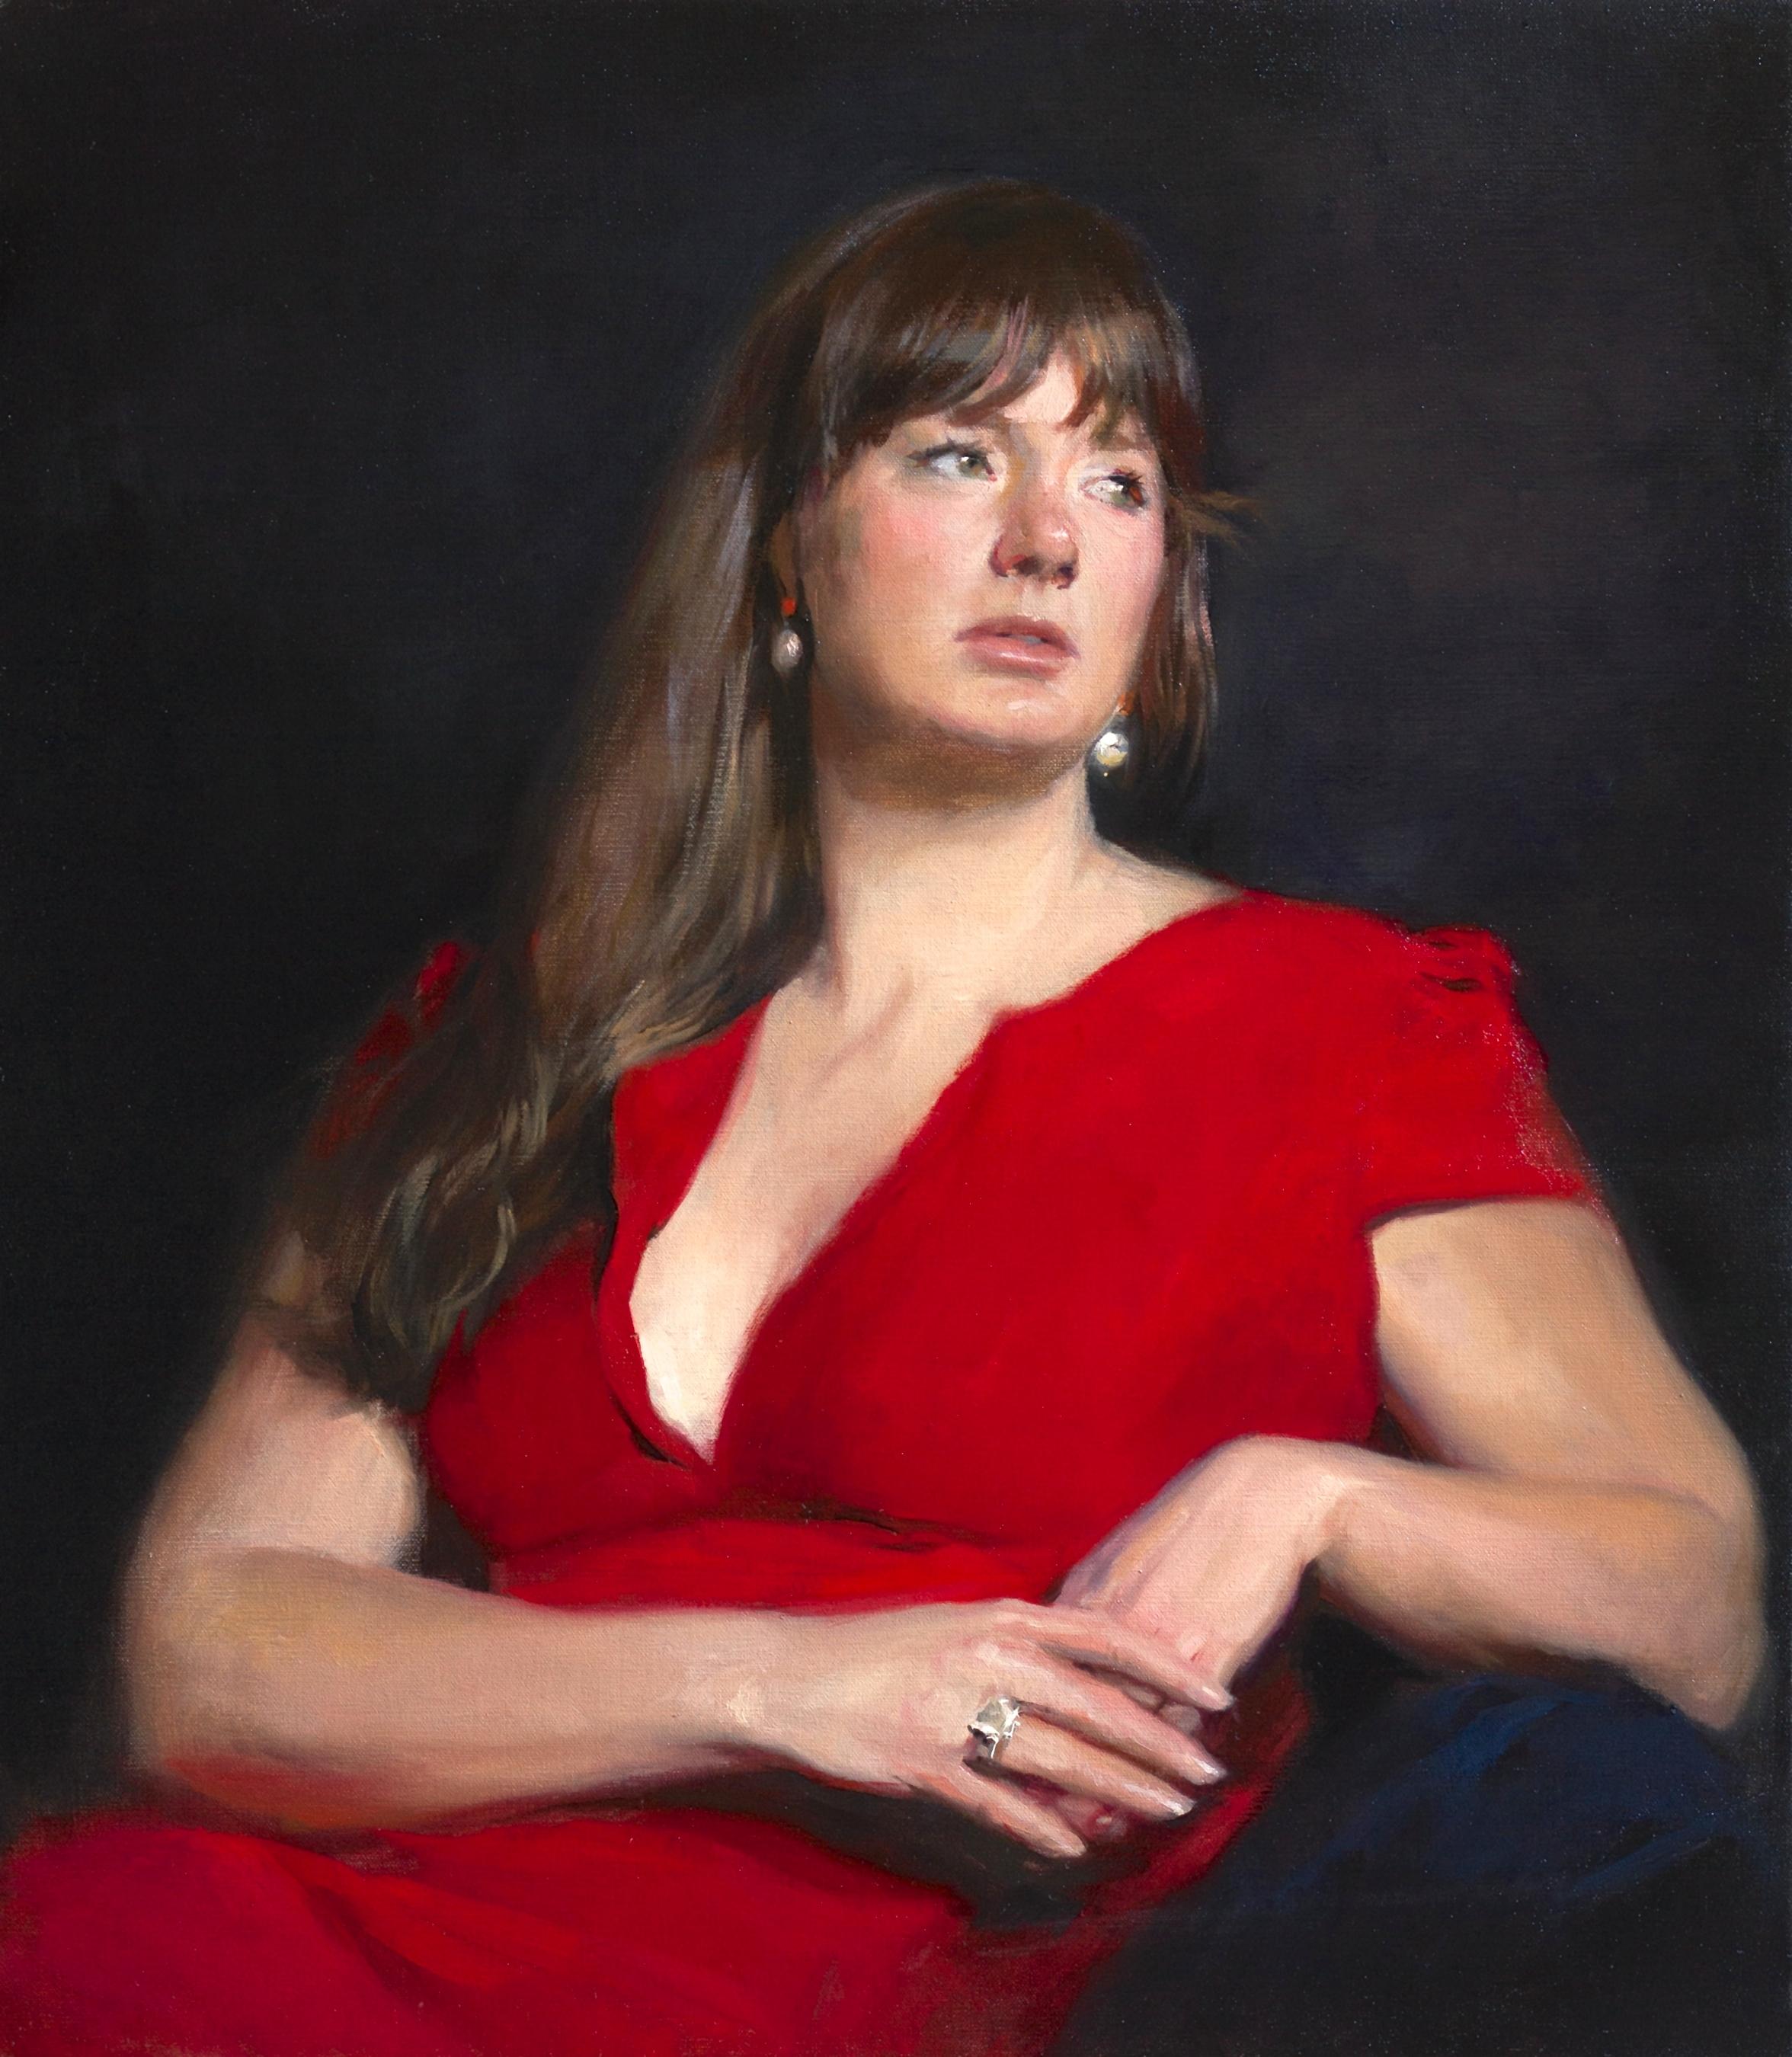 'Georgina' 90 cm x 70 cm Oil on linen